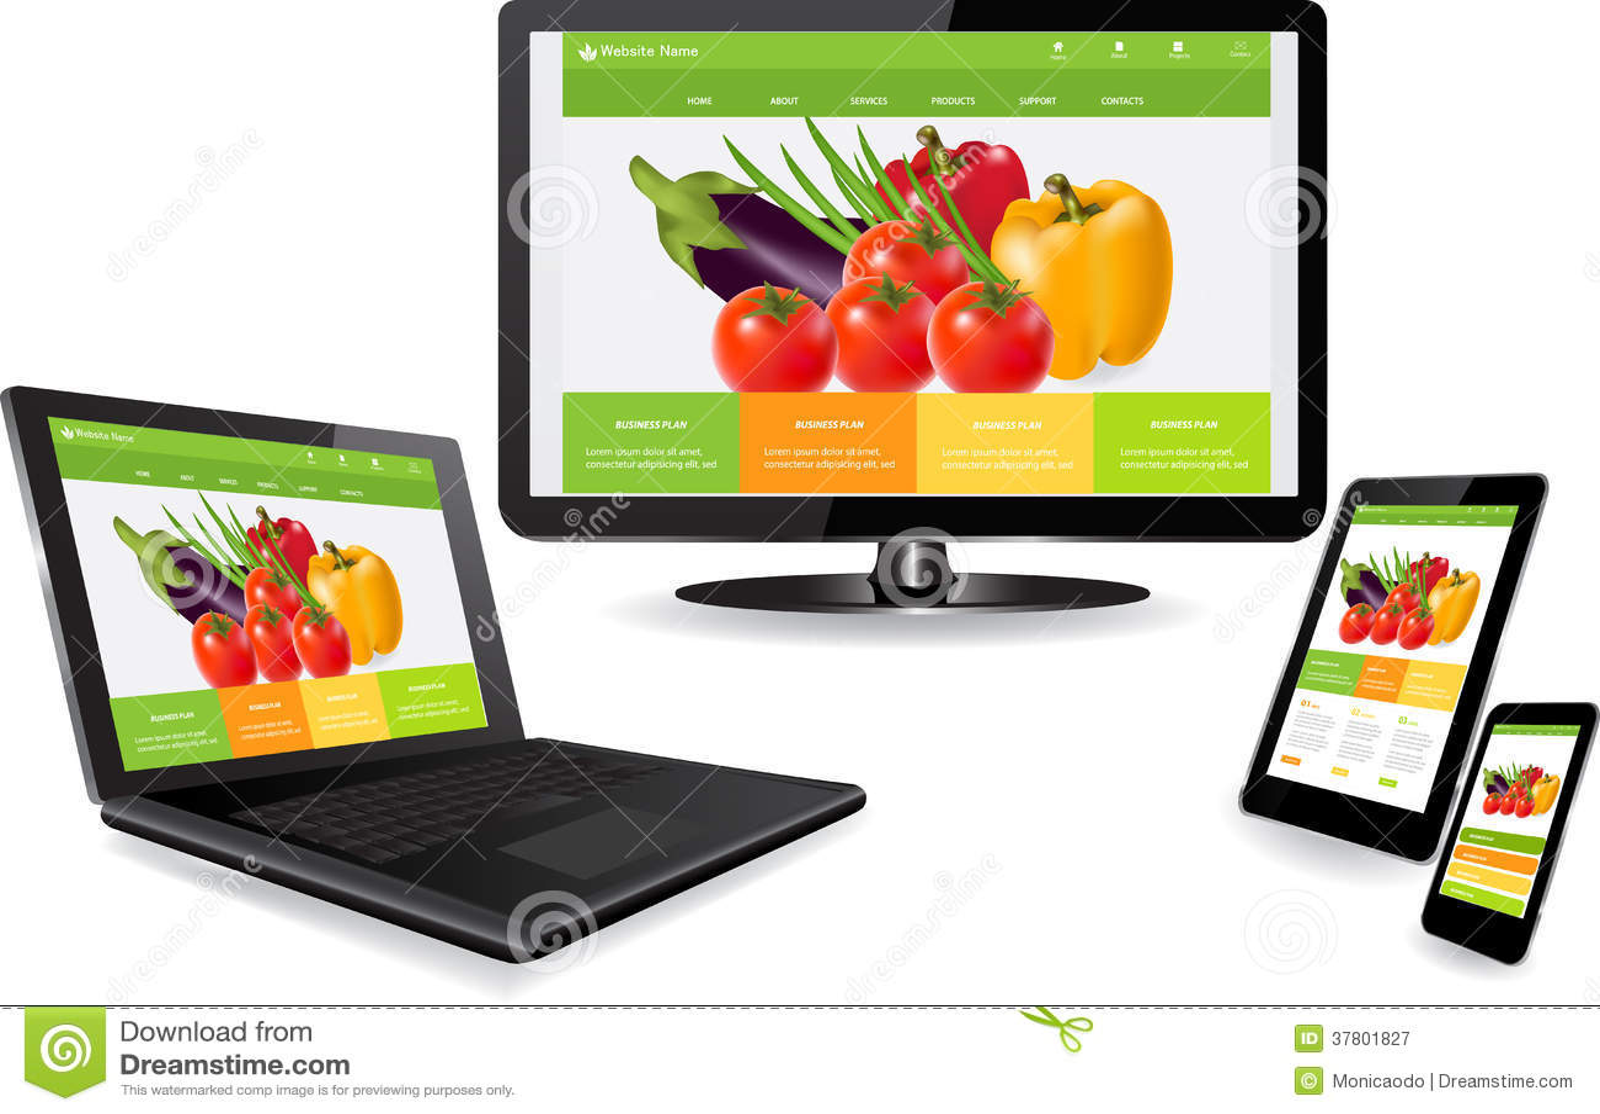 website design free download